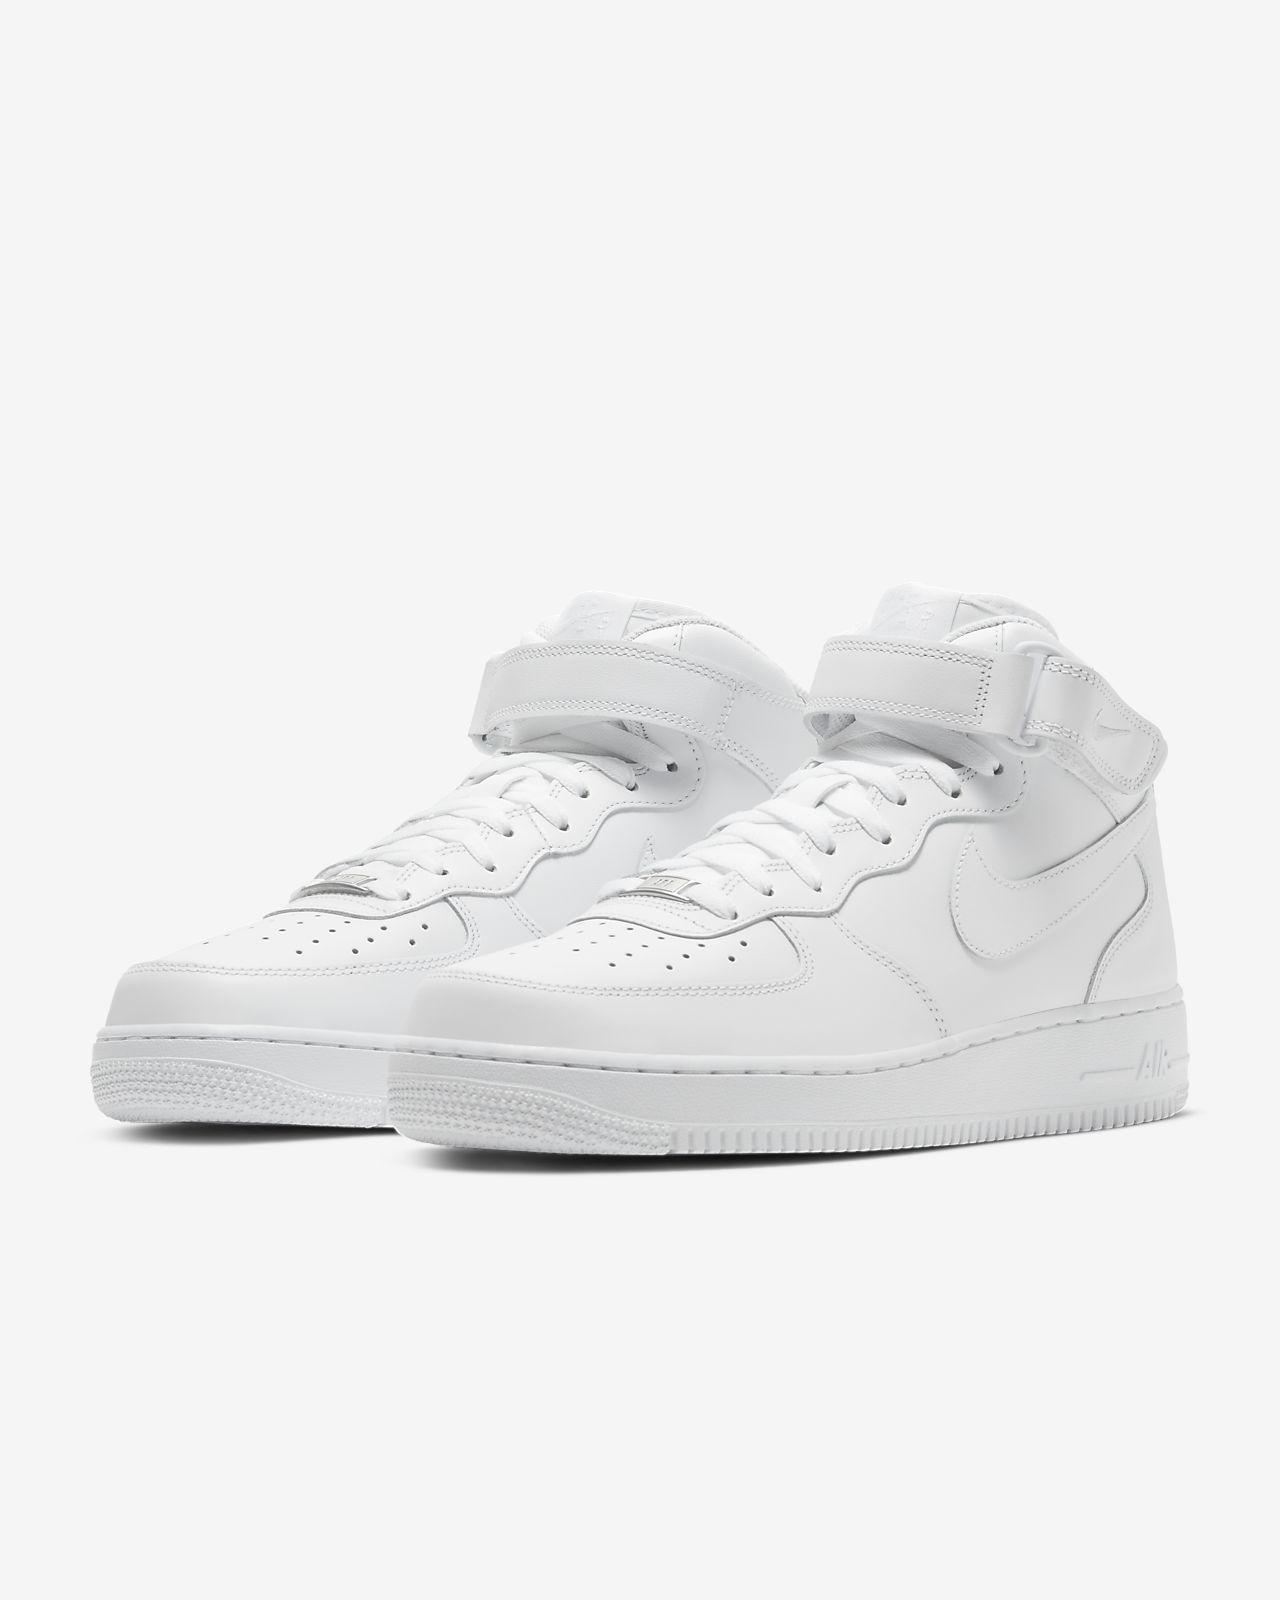 Nike White Mens Footwear US 2017 Nike Air Force 1 Low Pivot